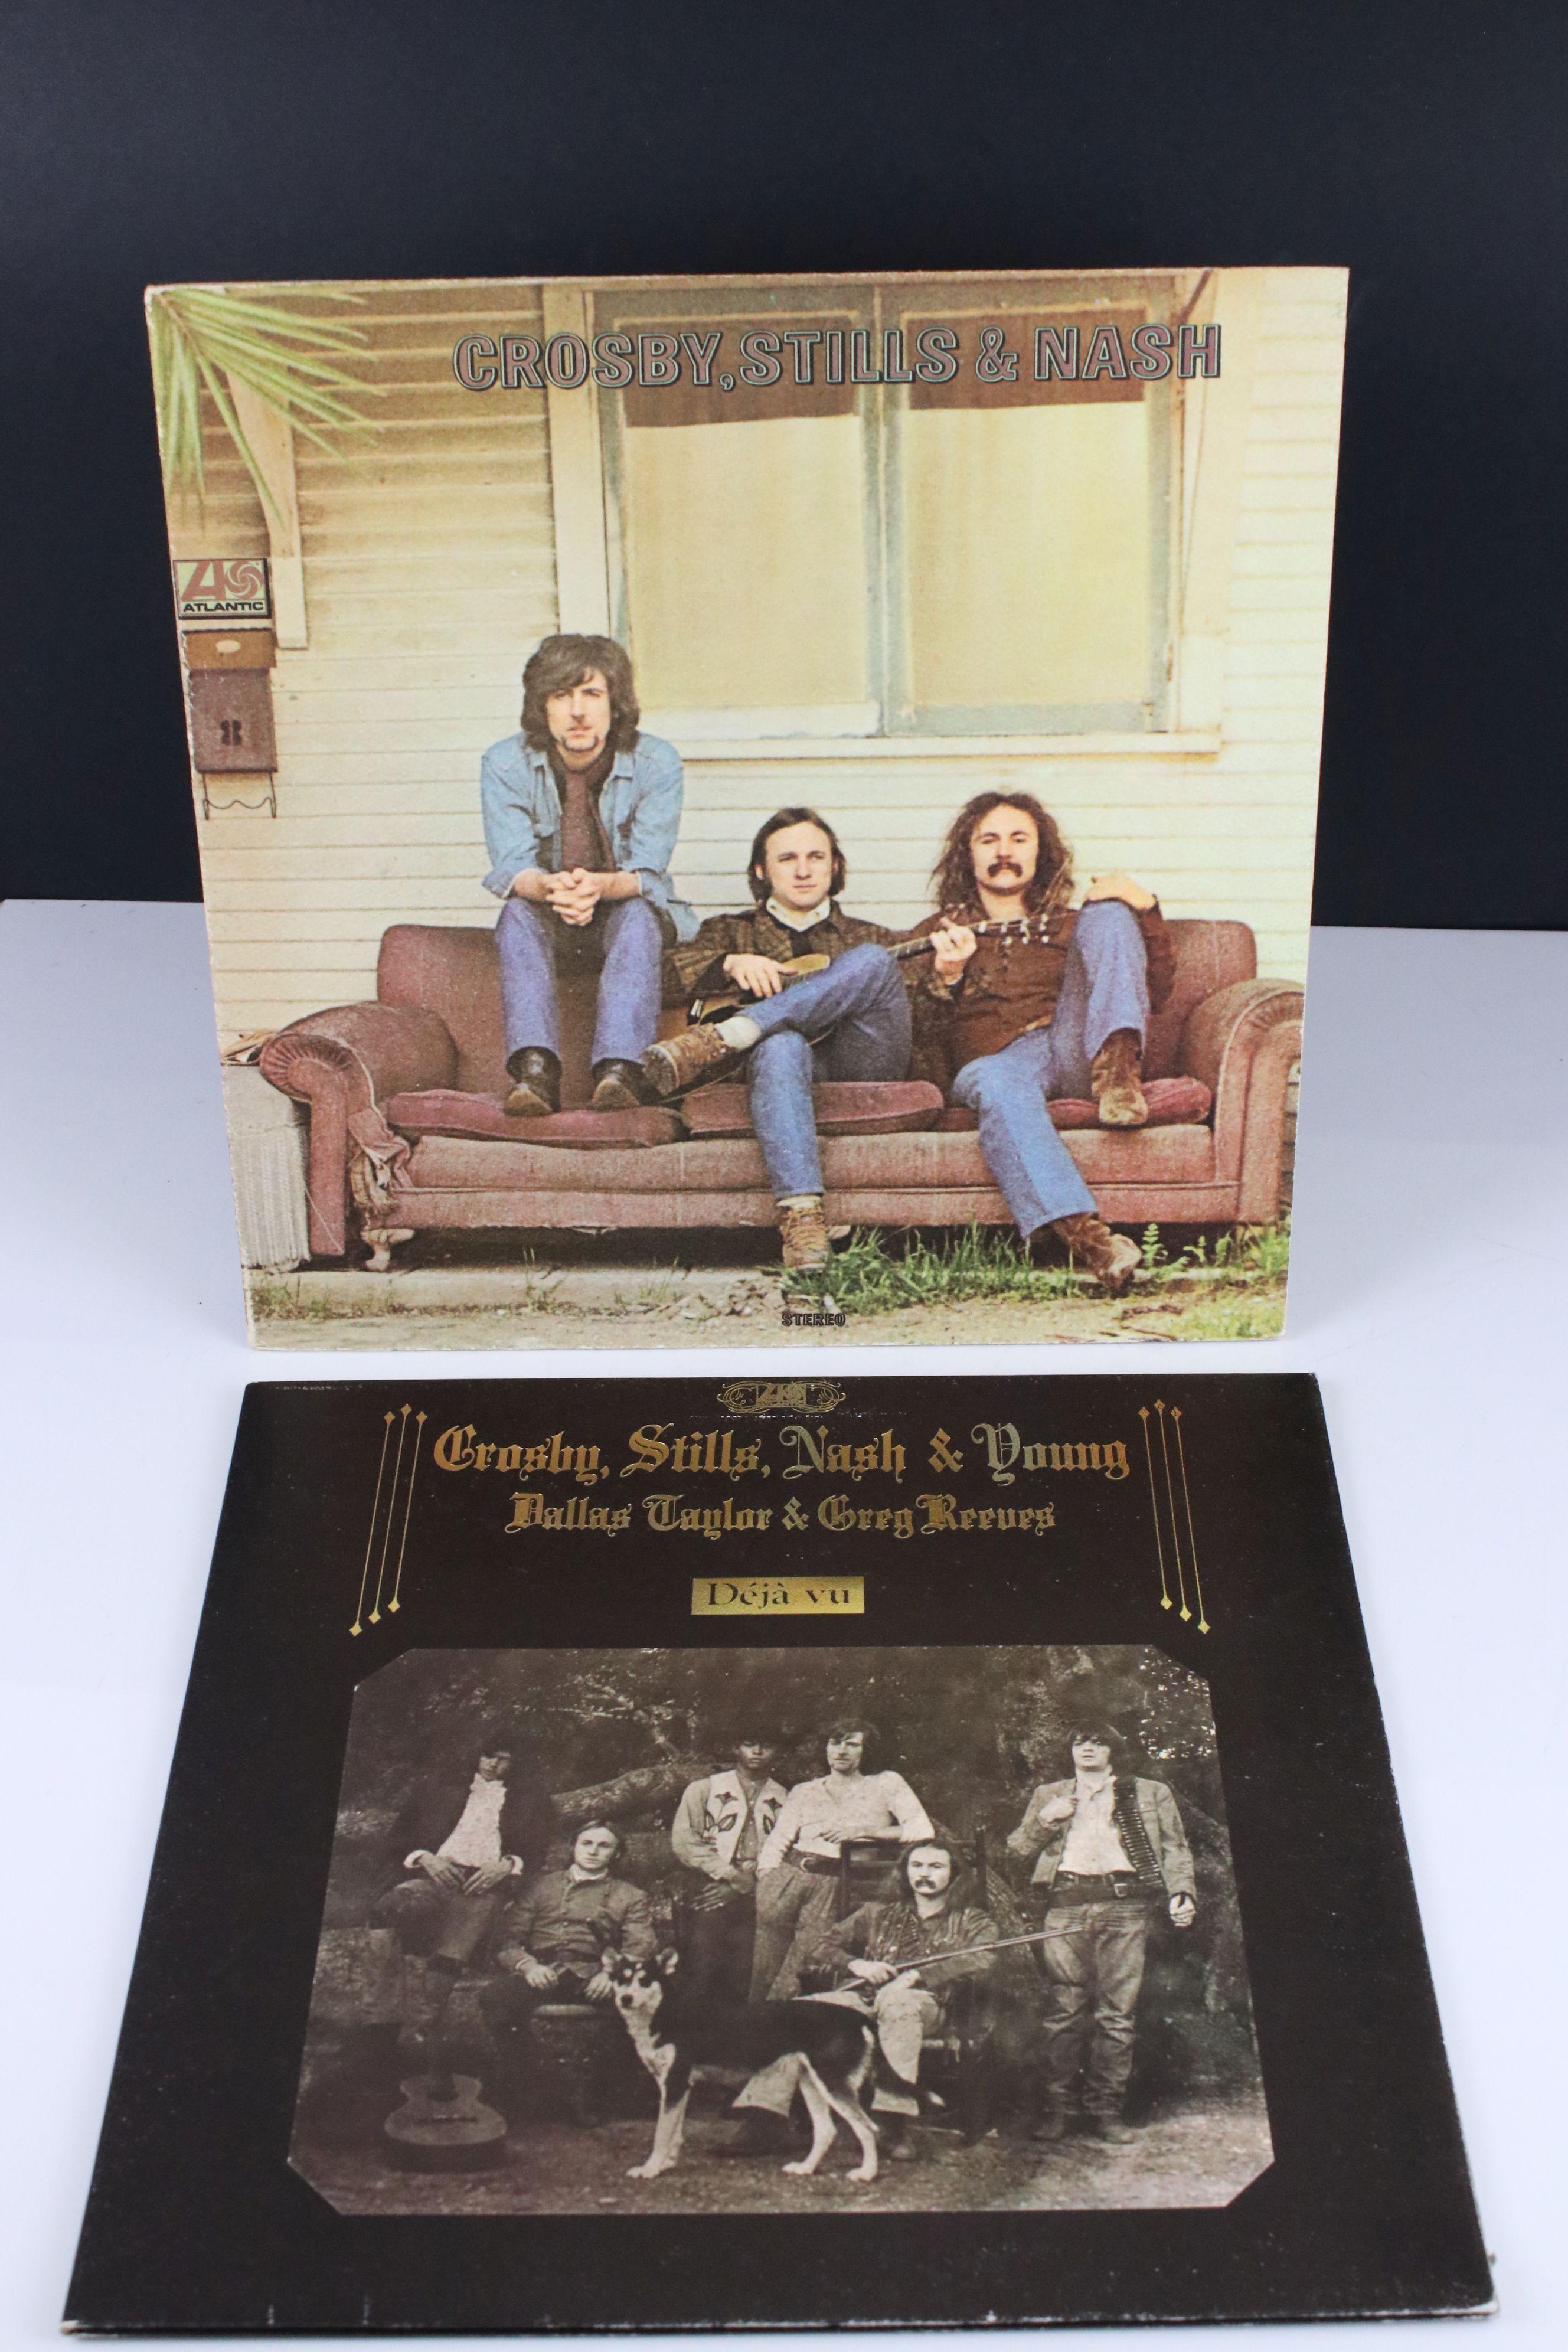 Vinyl - Crosby, Stills, Nash & Young Deja Vu (Atlantic 2401 001) red and plum Atlantic label with